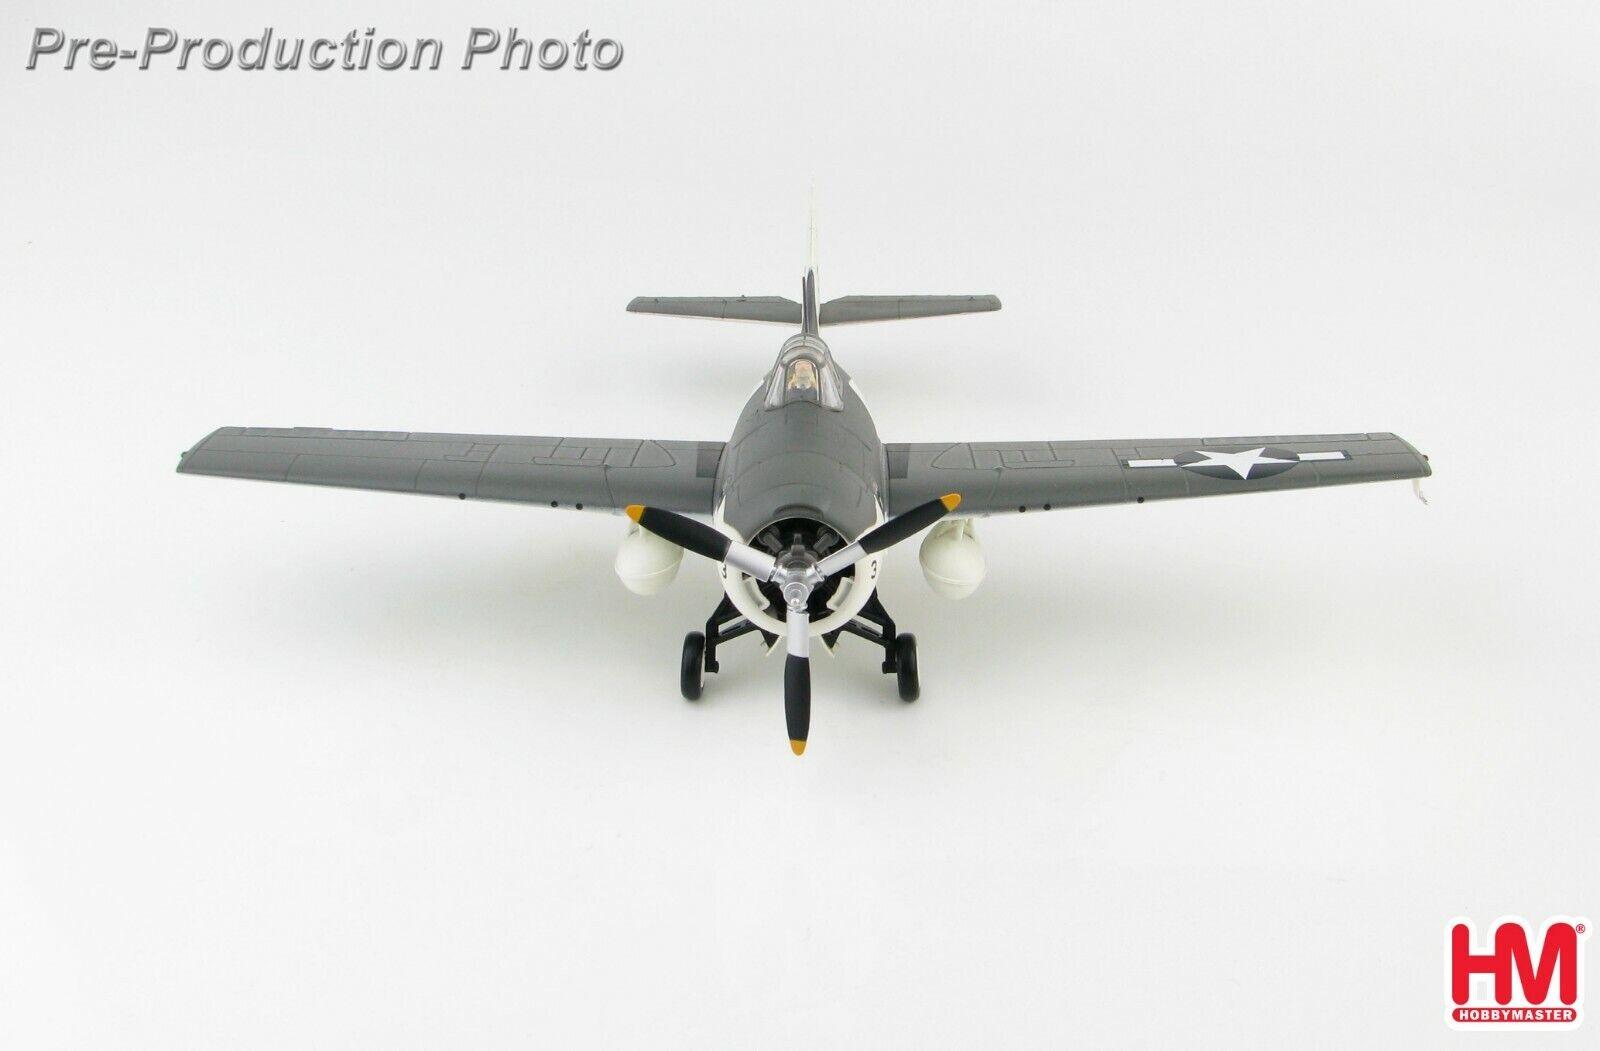 Hobby Master HA8903,Grumman F4F-4 Wildcat 46685, VC-12, USS Core, 1944